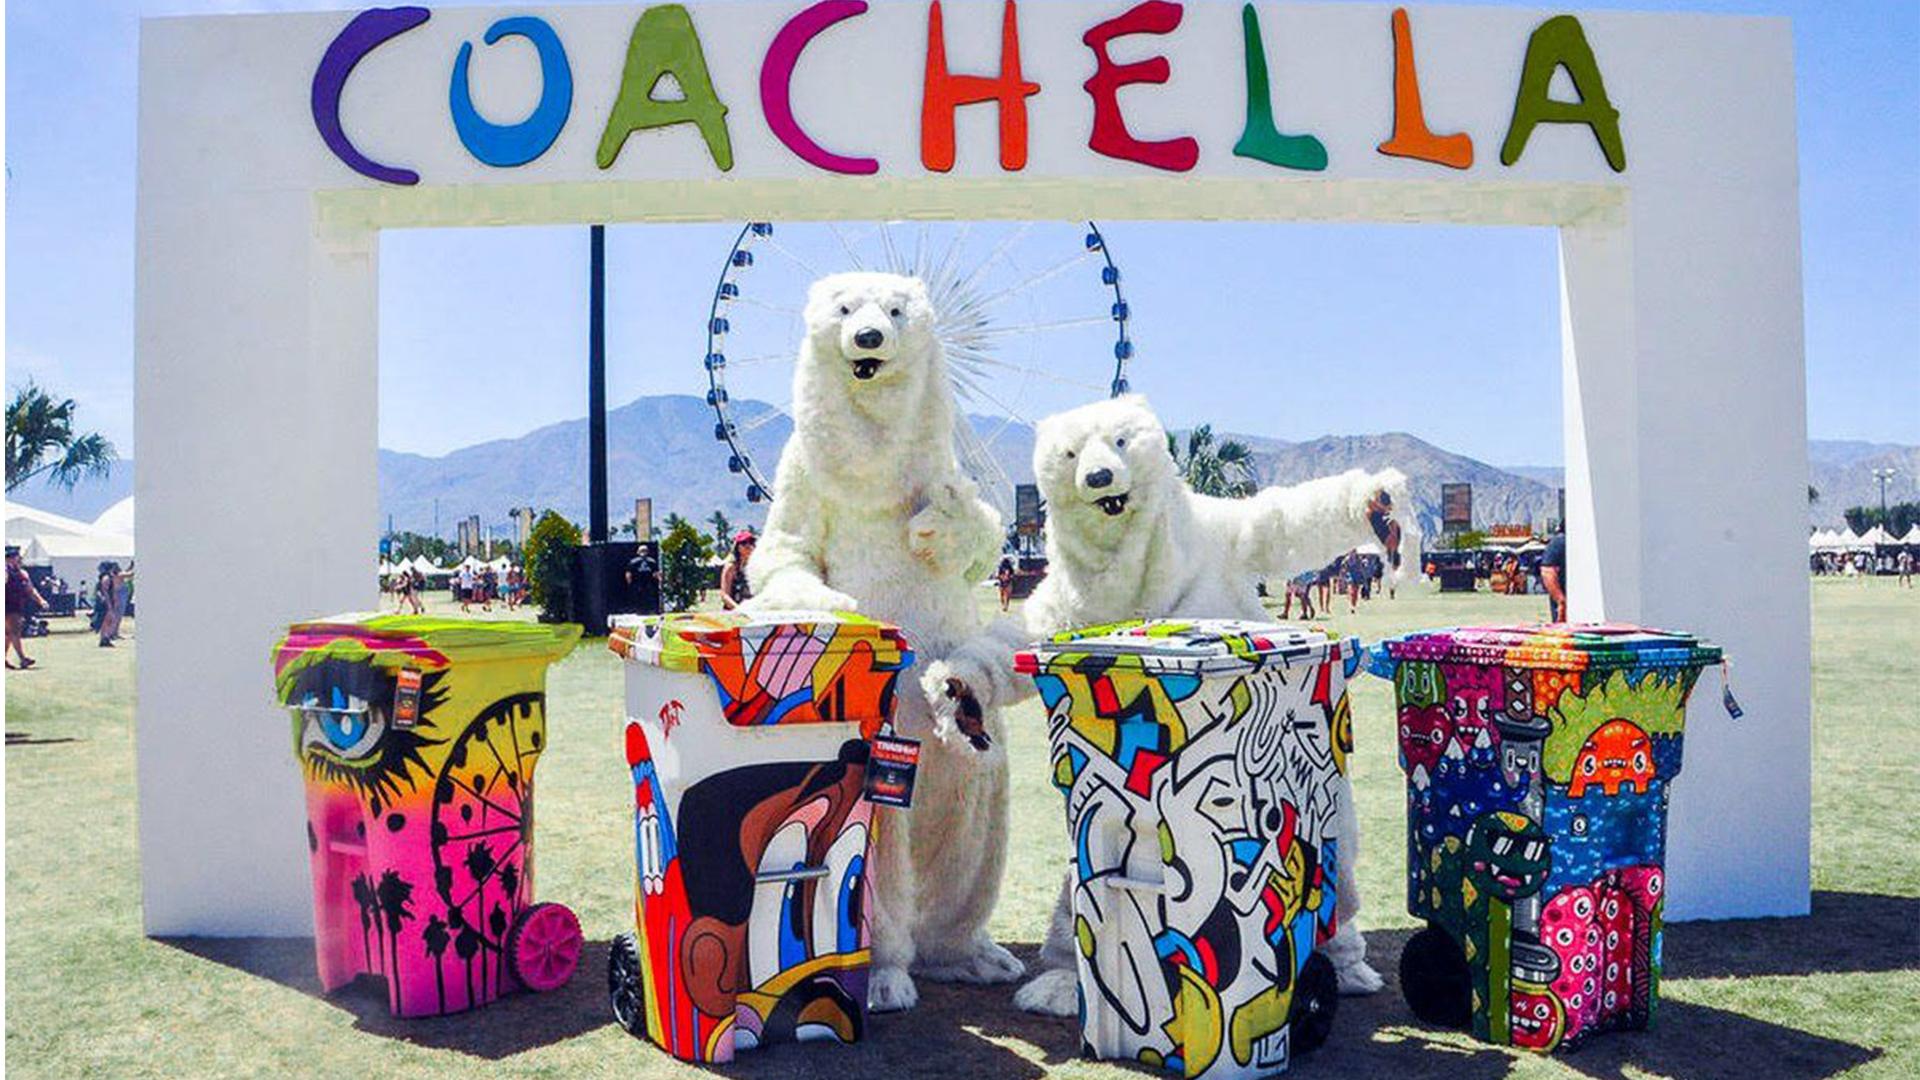 Coachella Twitter account4